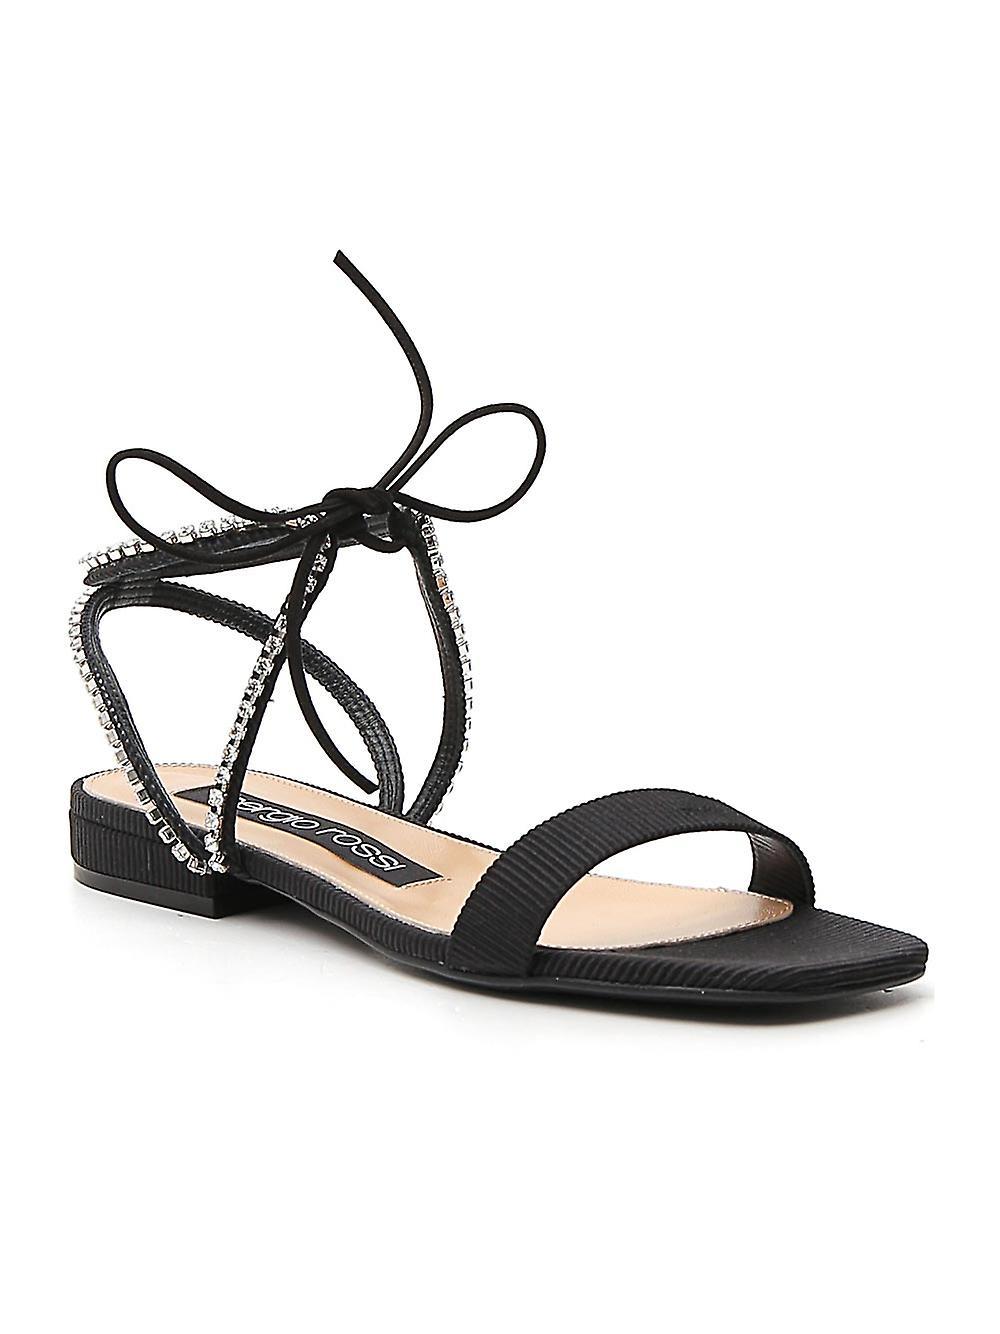 Sergio Rossi A88410mfn9241498 Femmes-apos;s Black Suede Sandals